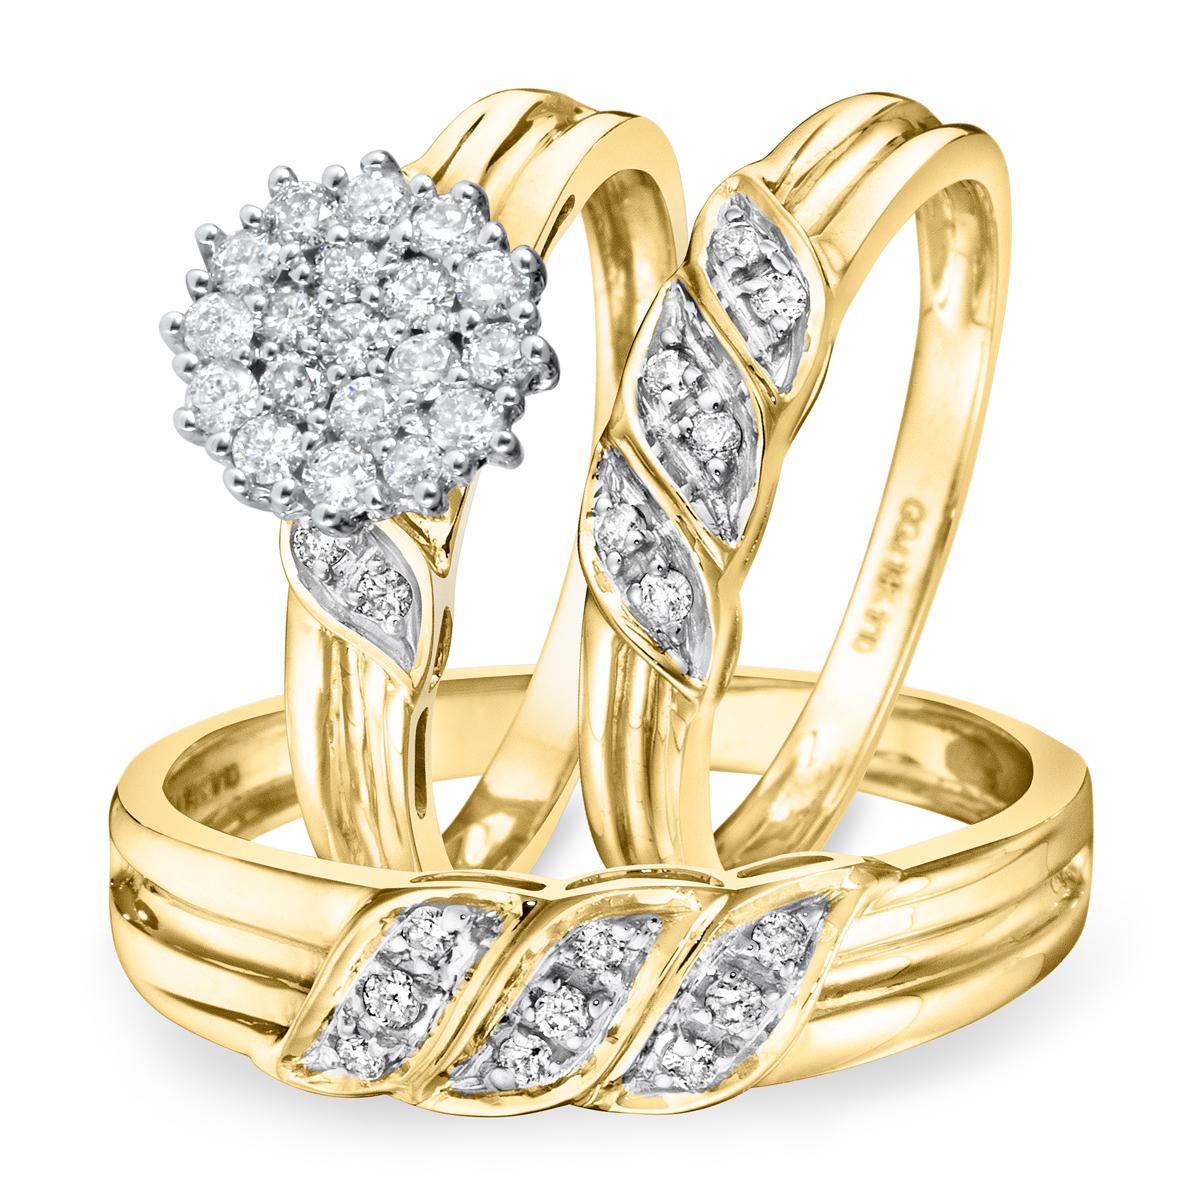 2/3 CT. T.W. Diamond Ladies Engagement Ring, Wedding Band, Men's Wedding Band